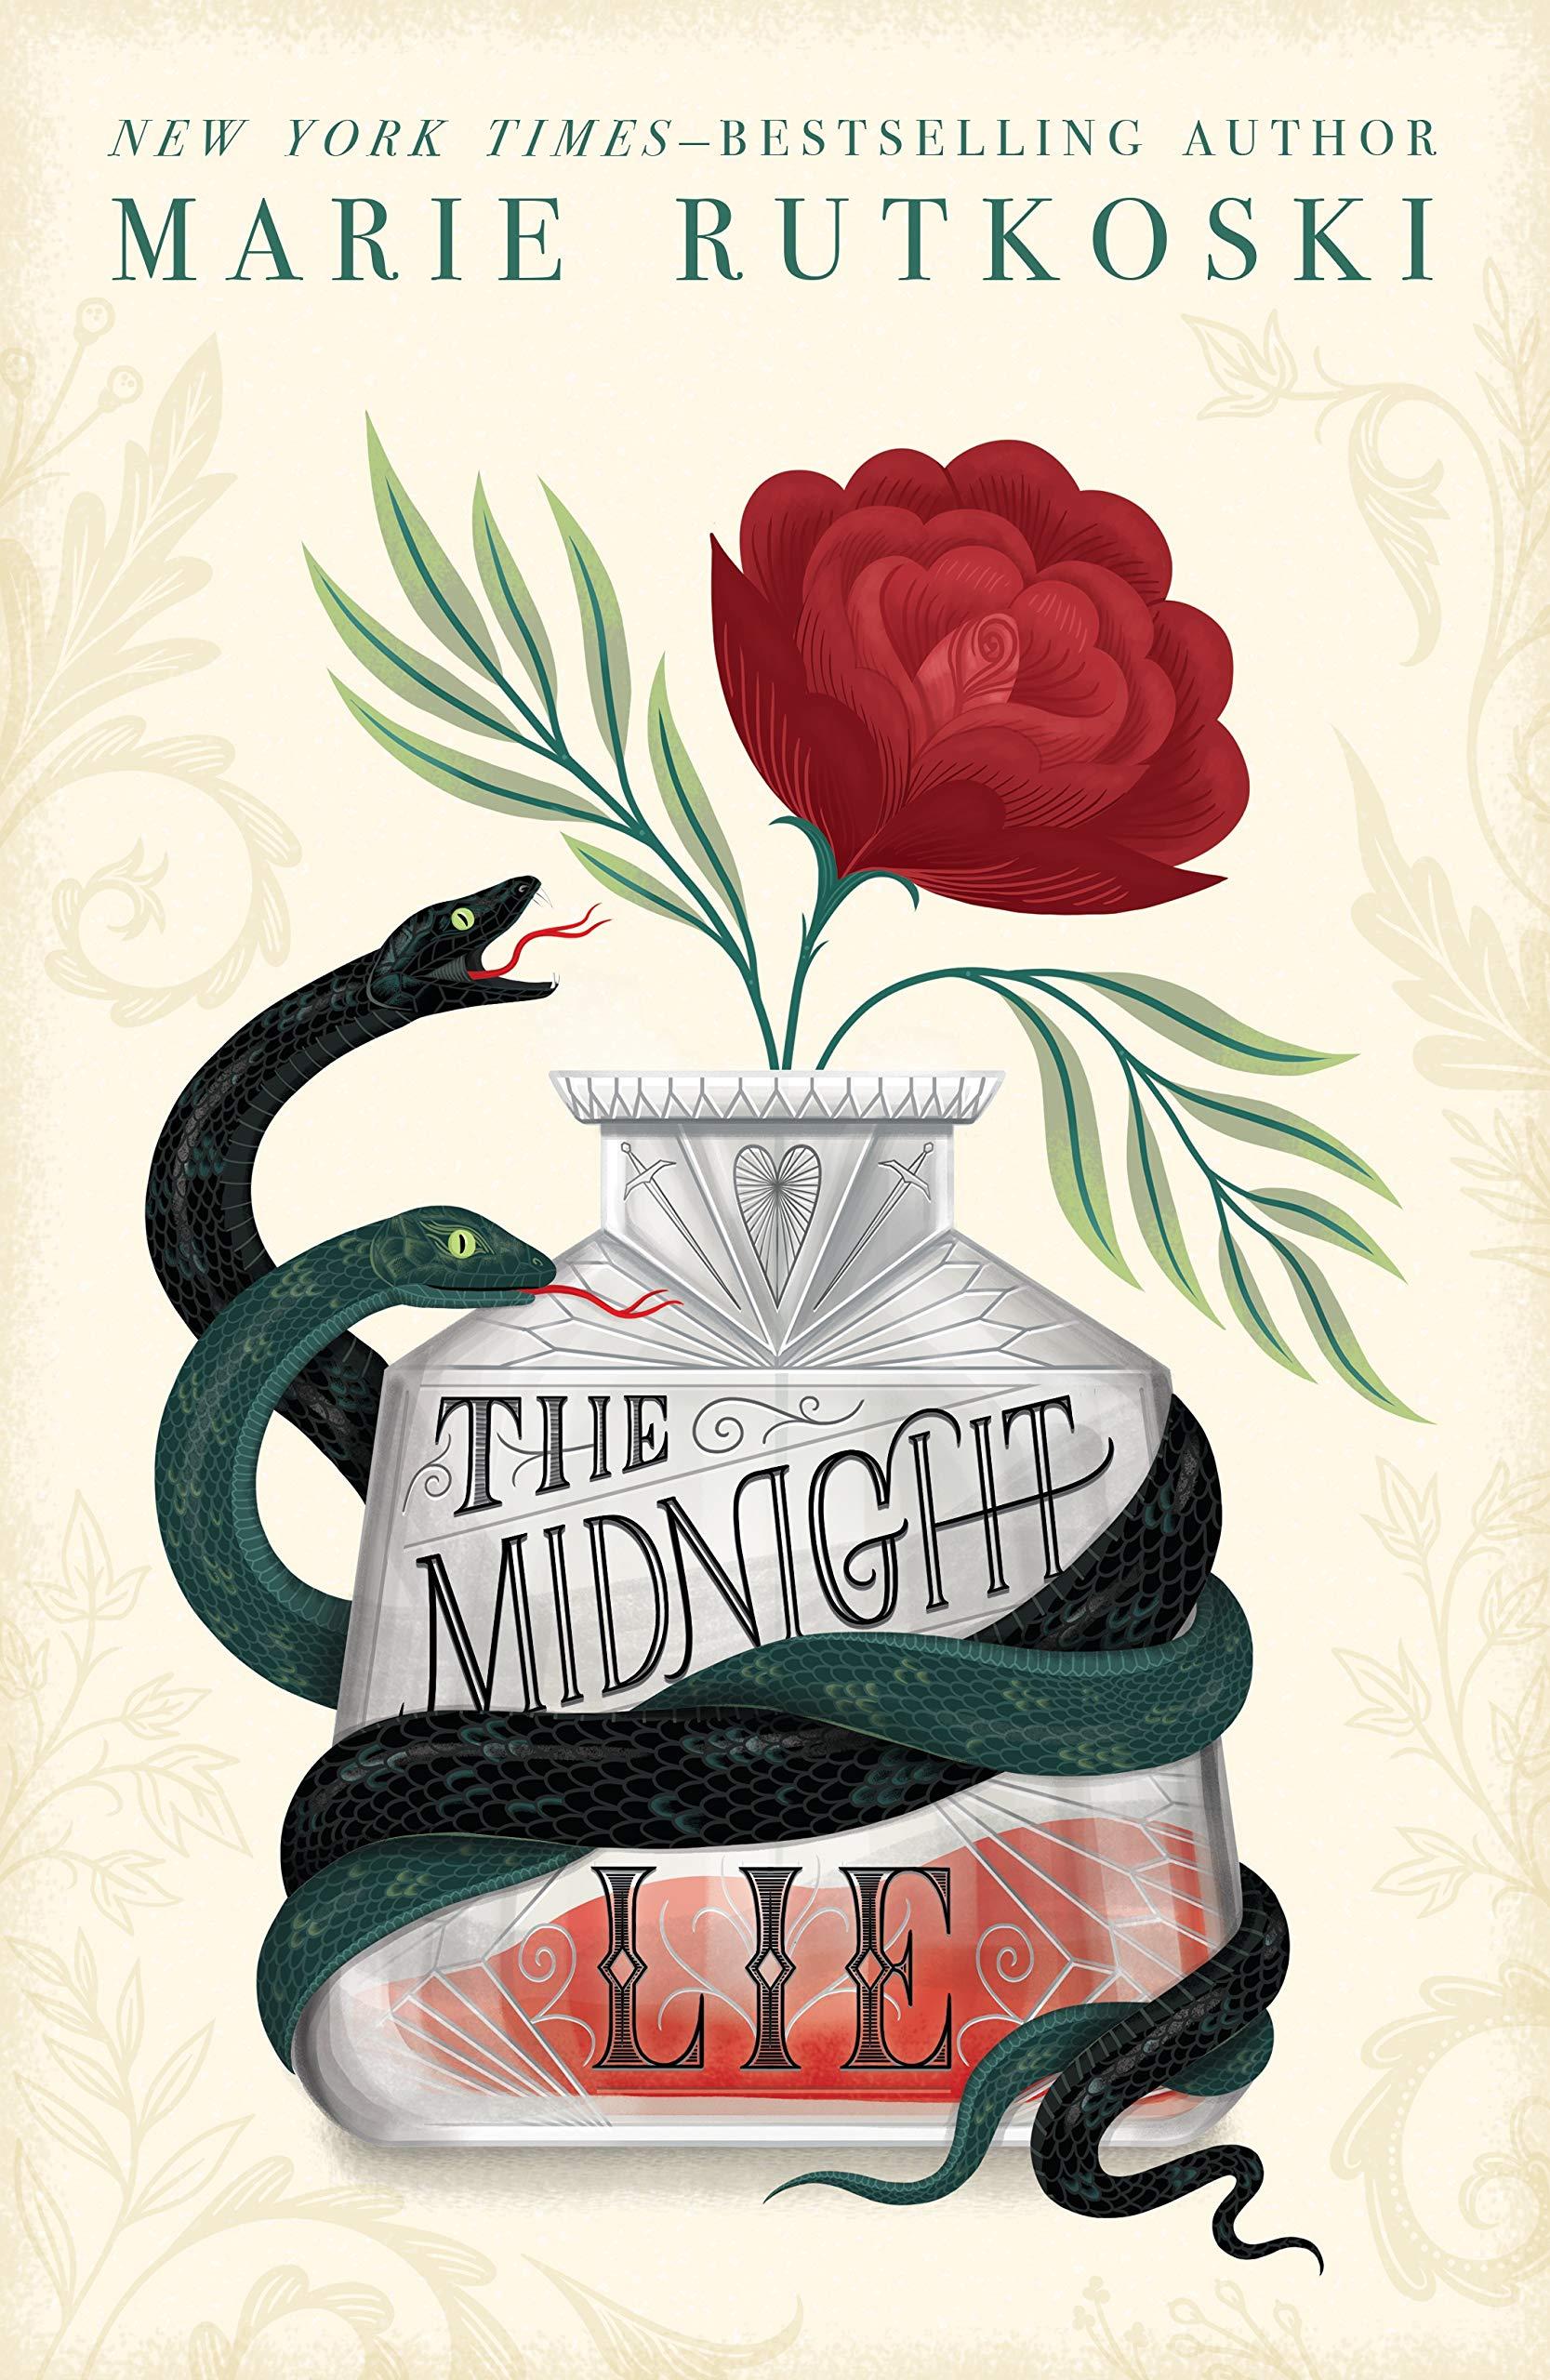 Amazon.com: The Midnight Lie (9780374306380): Rutkoski, Marie: Books